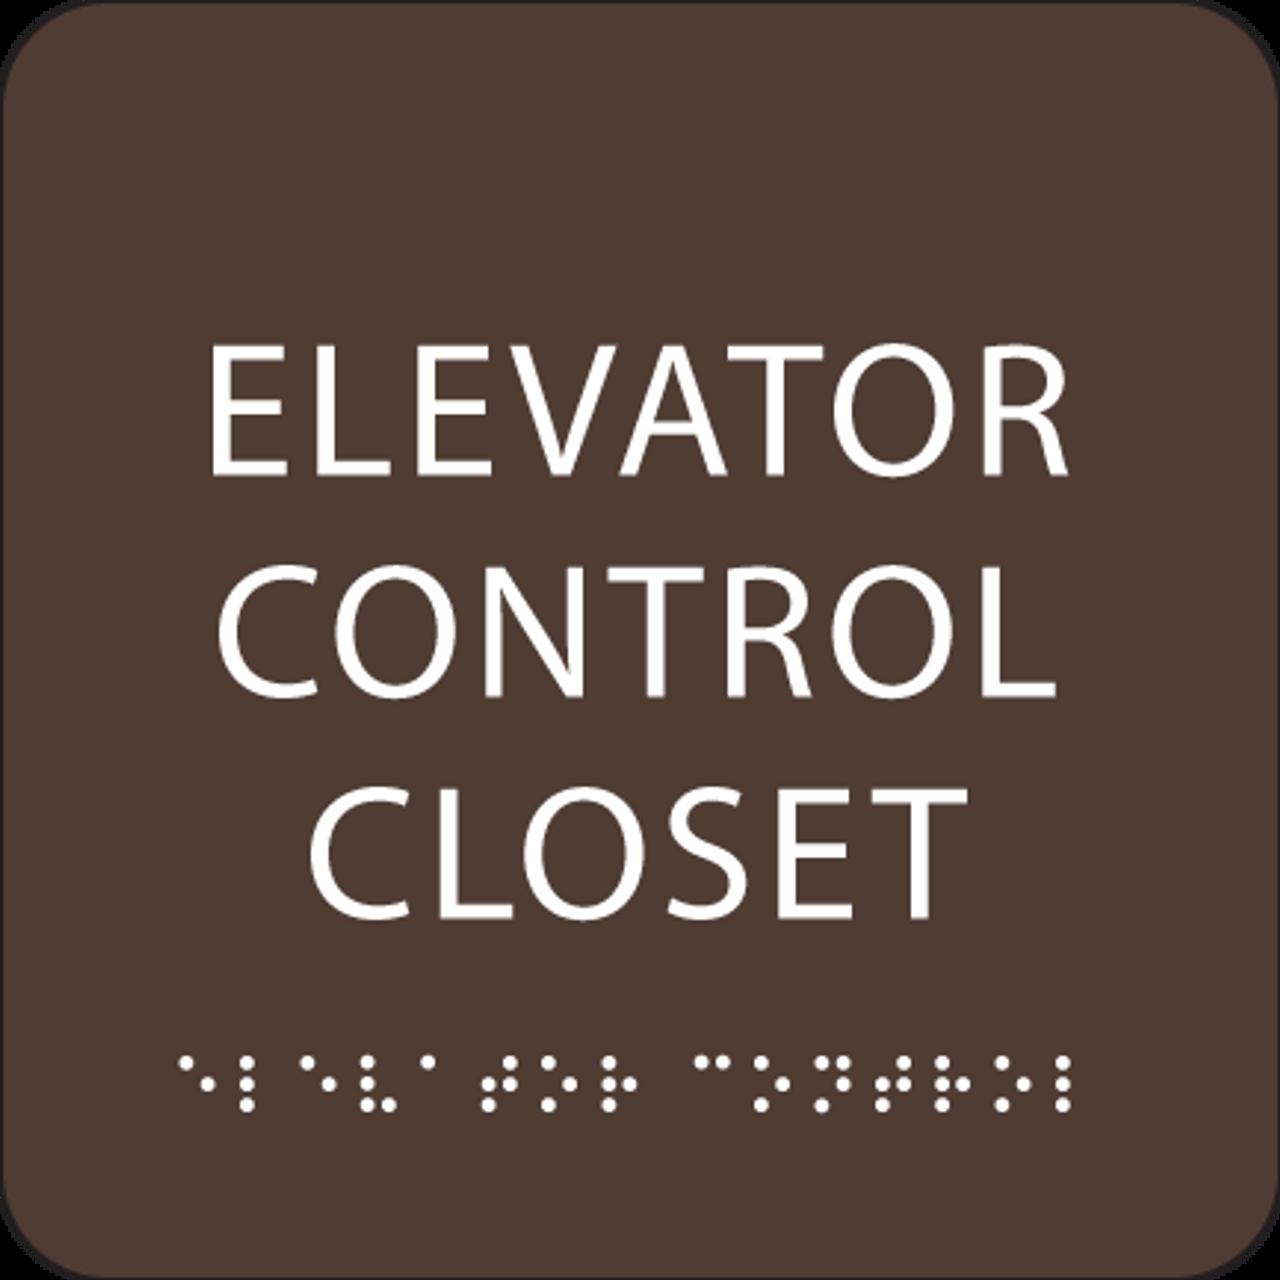 Dark Brown Elevator Control Closet ADA Sign